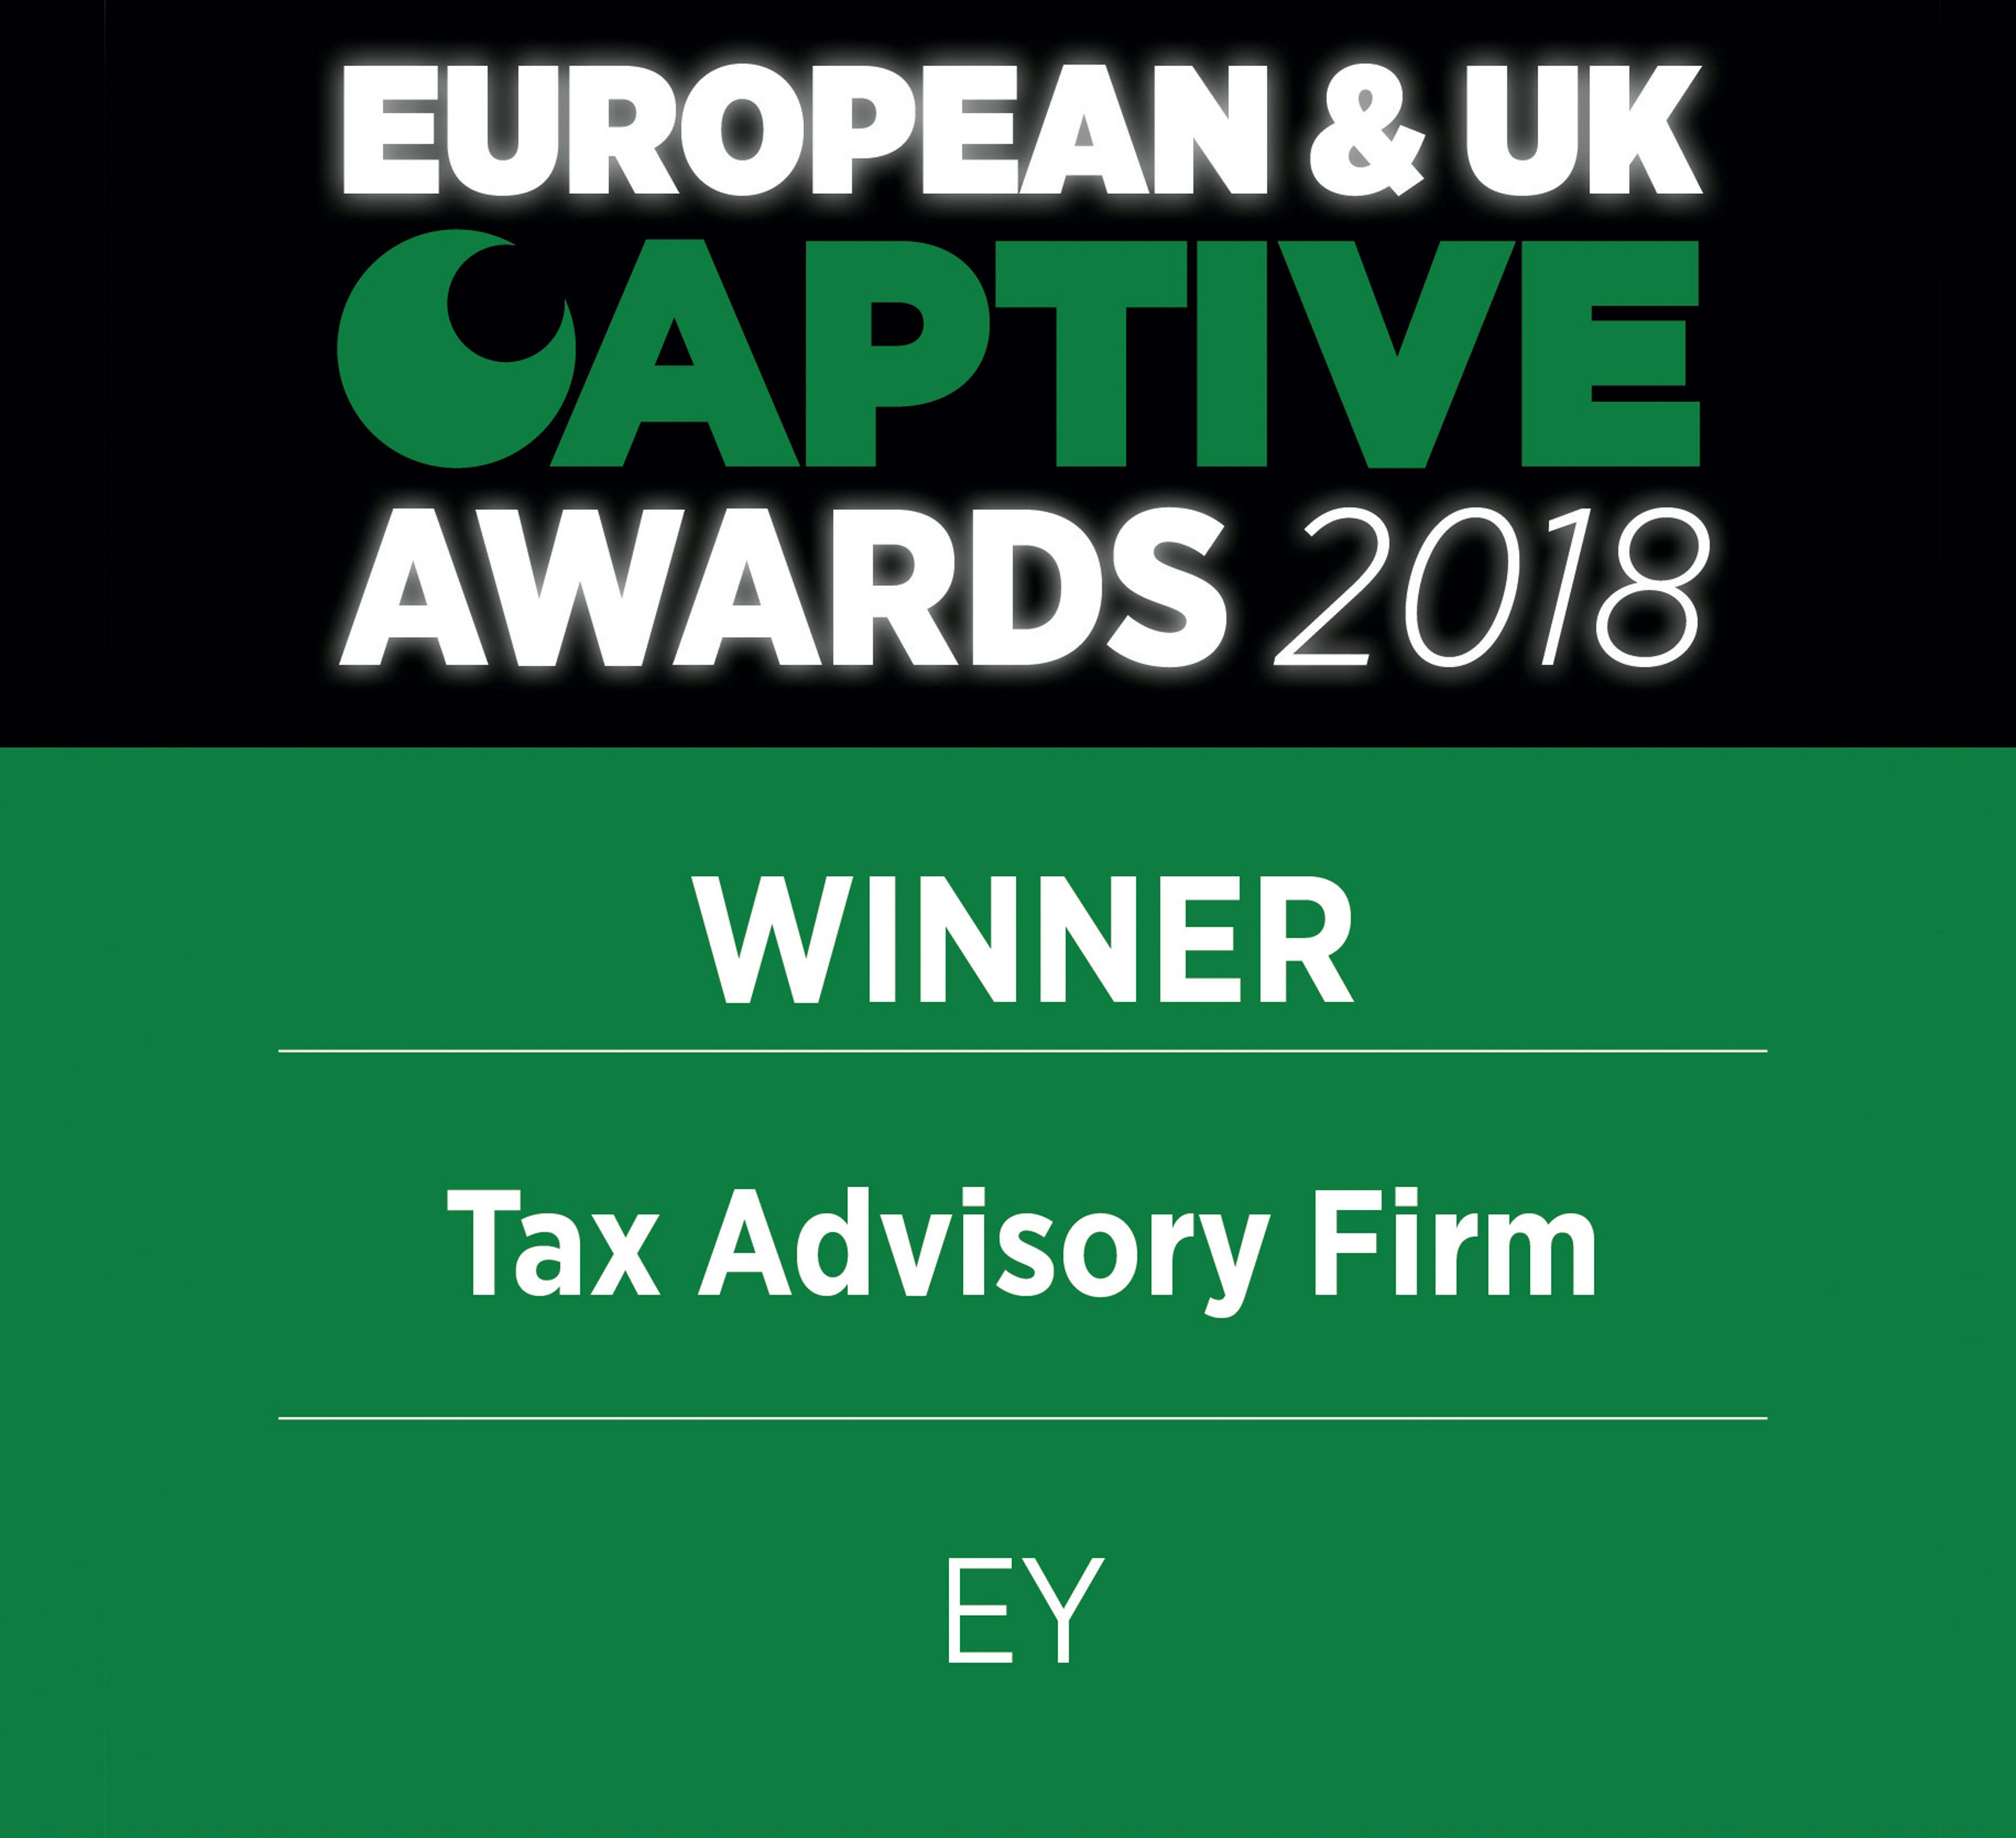 European & UK Captive Awards 2018 Winner Tax Advisory Firm EY